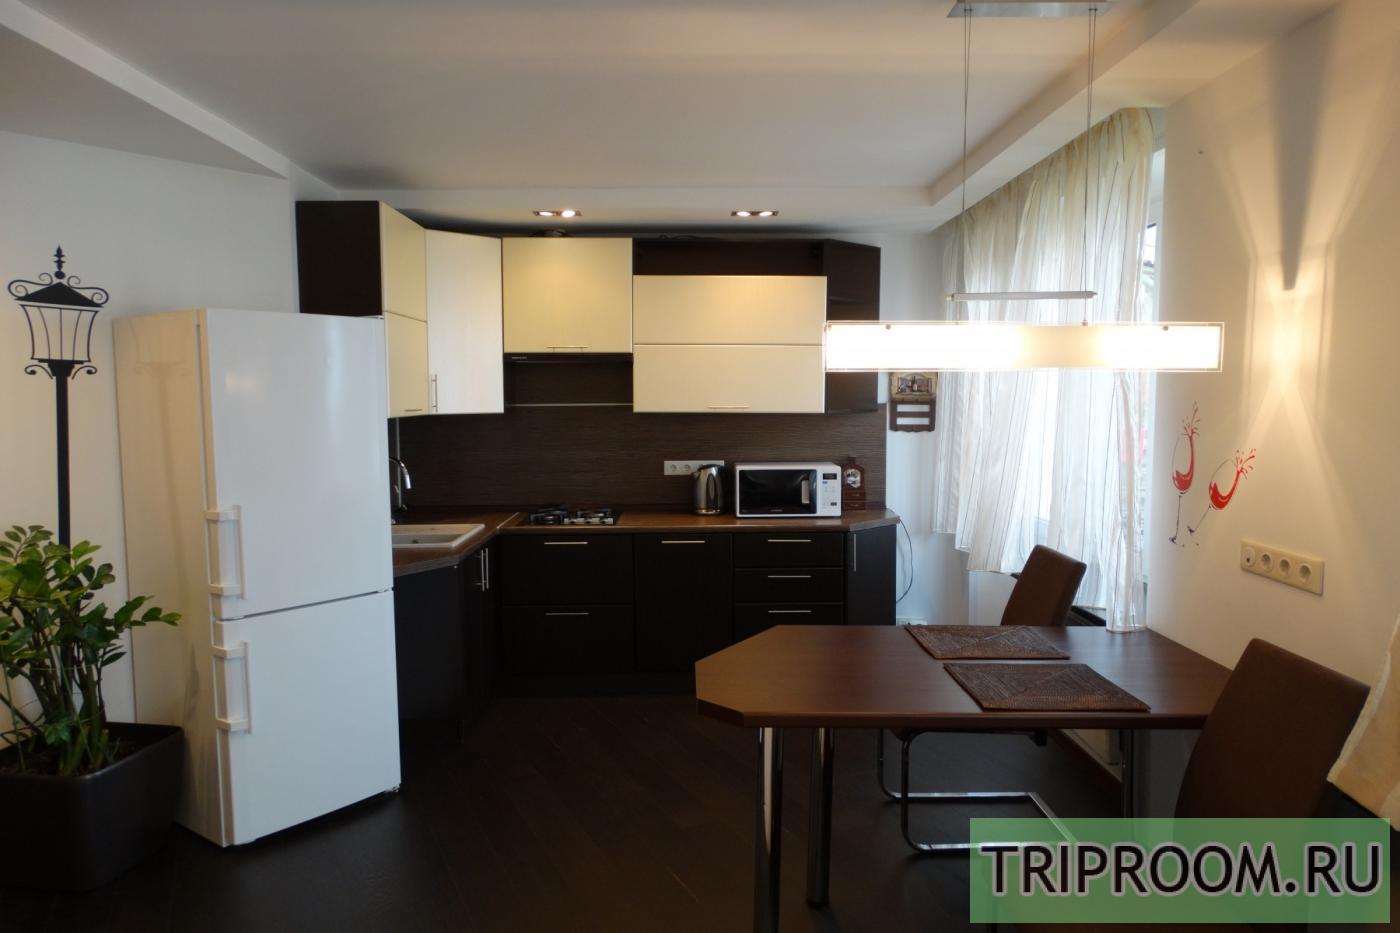 1-комнатная квартира посуточно (вариант № 22157), ул. Архитектора Власова улица, фото № 3